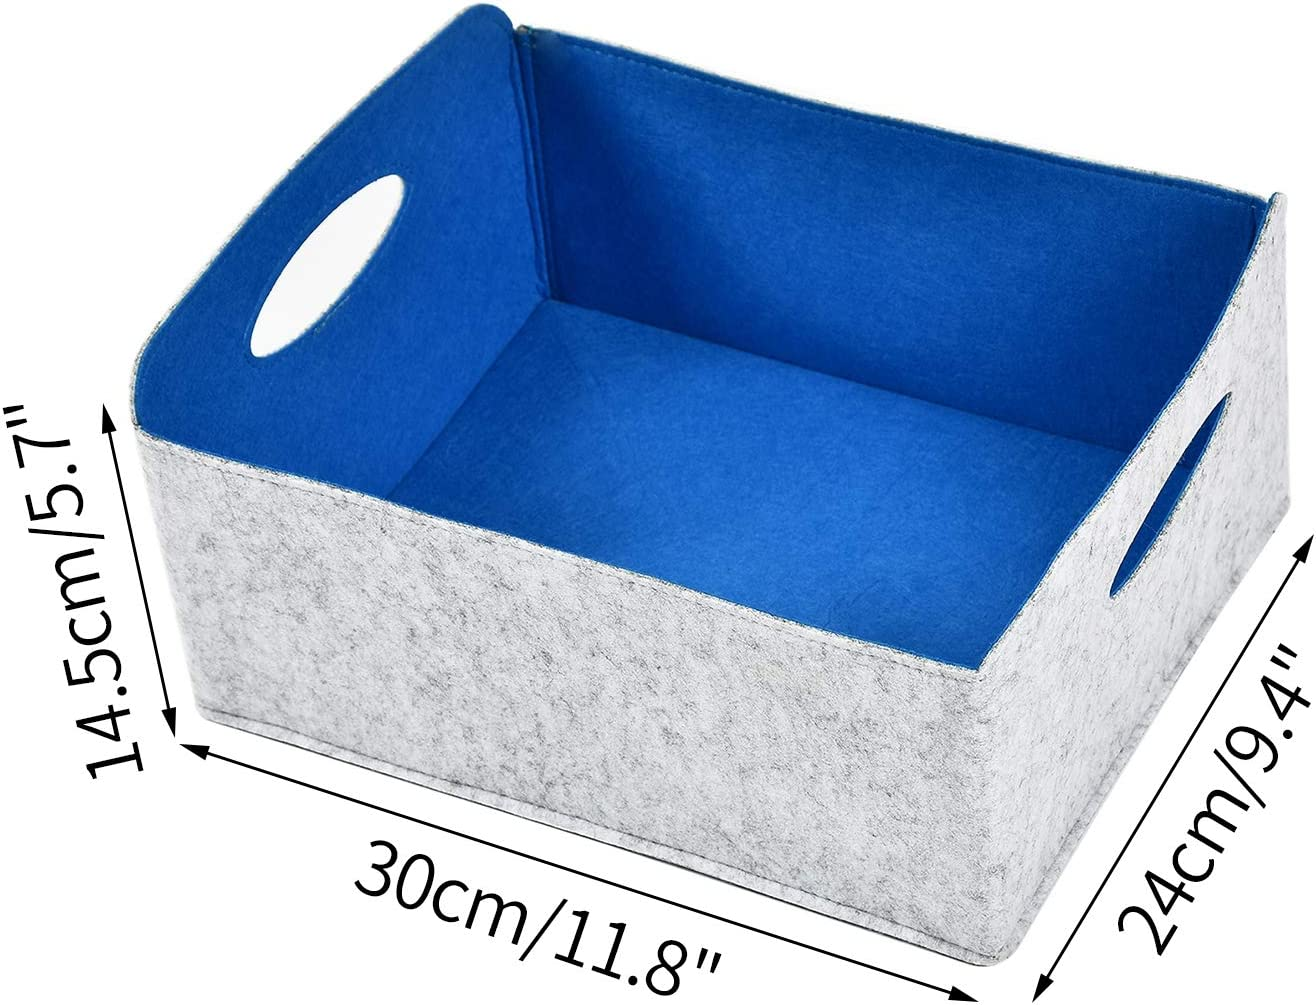 Dake Felt Basket Storage Storage Box with Handles Foldable Open Laundry Hamper for Underwear Socks Towel Toy Organizers Blue